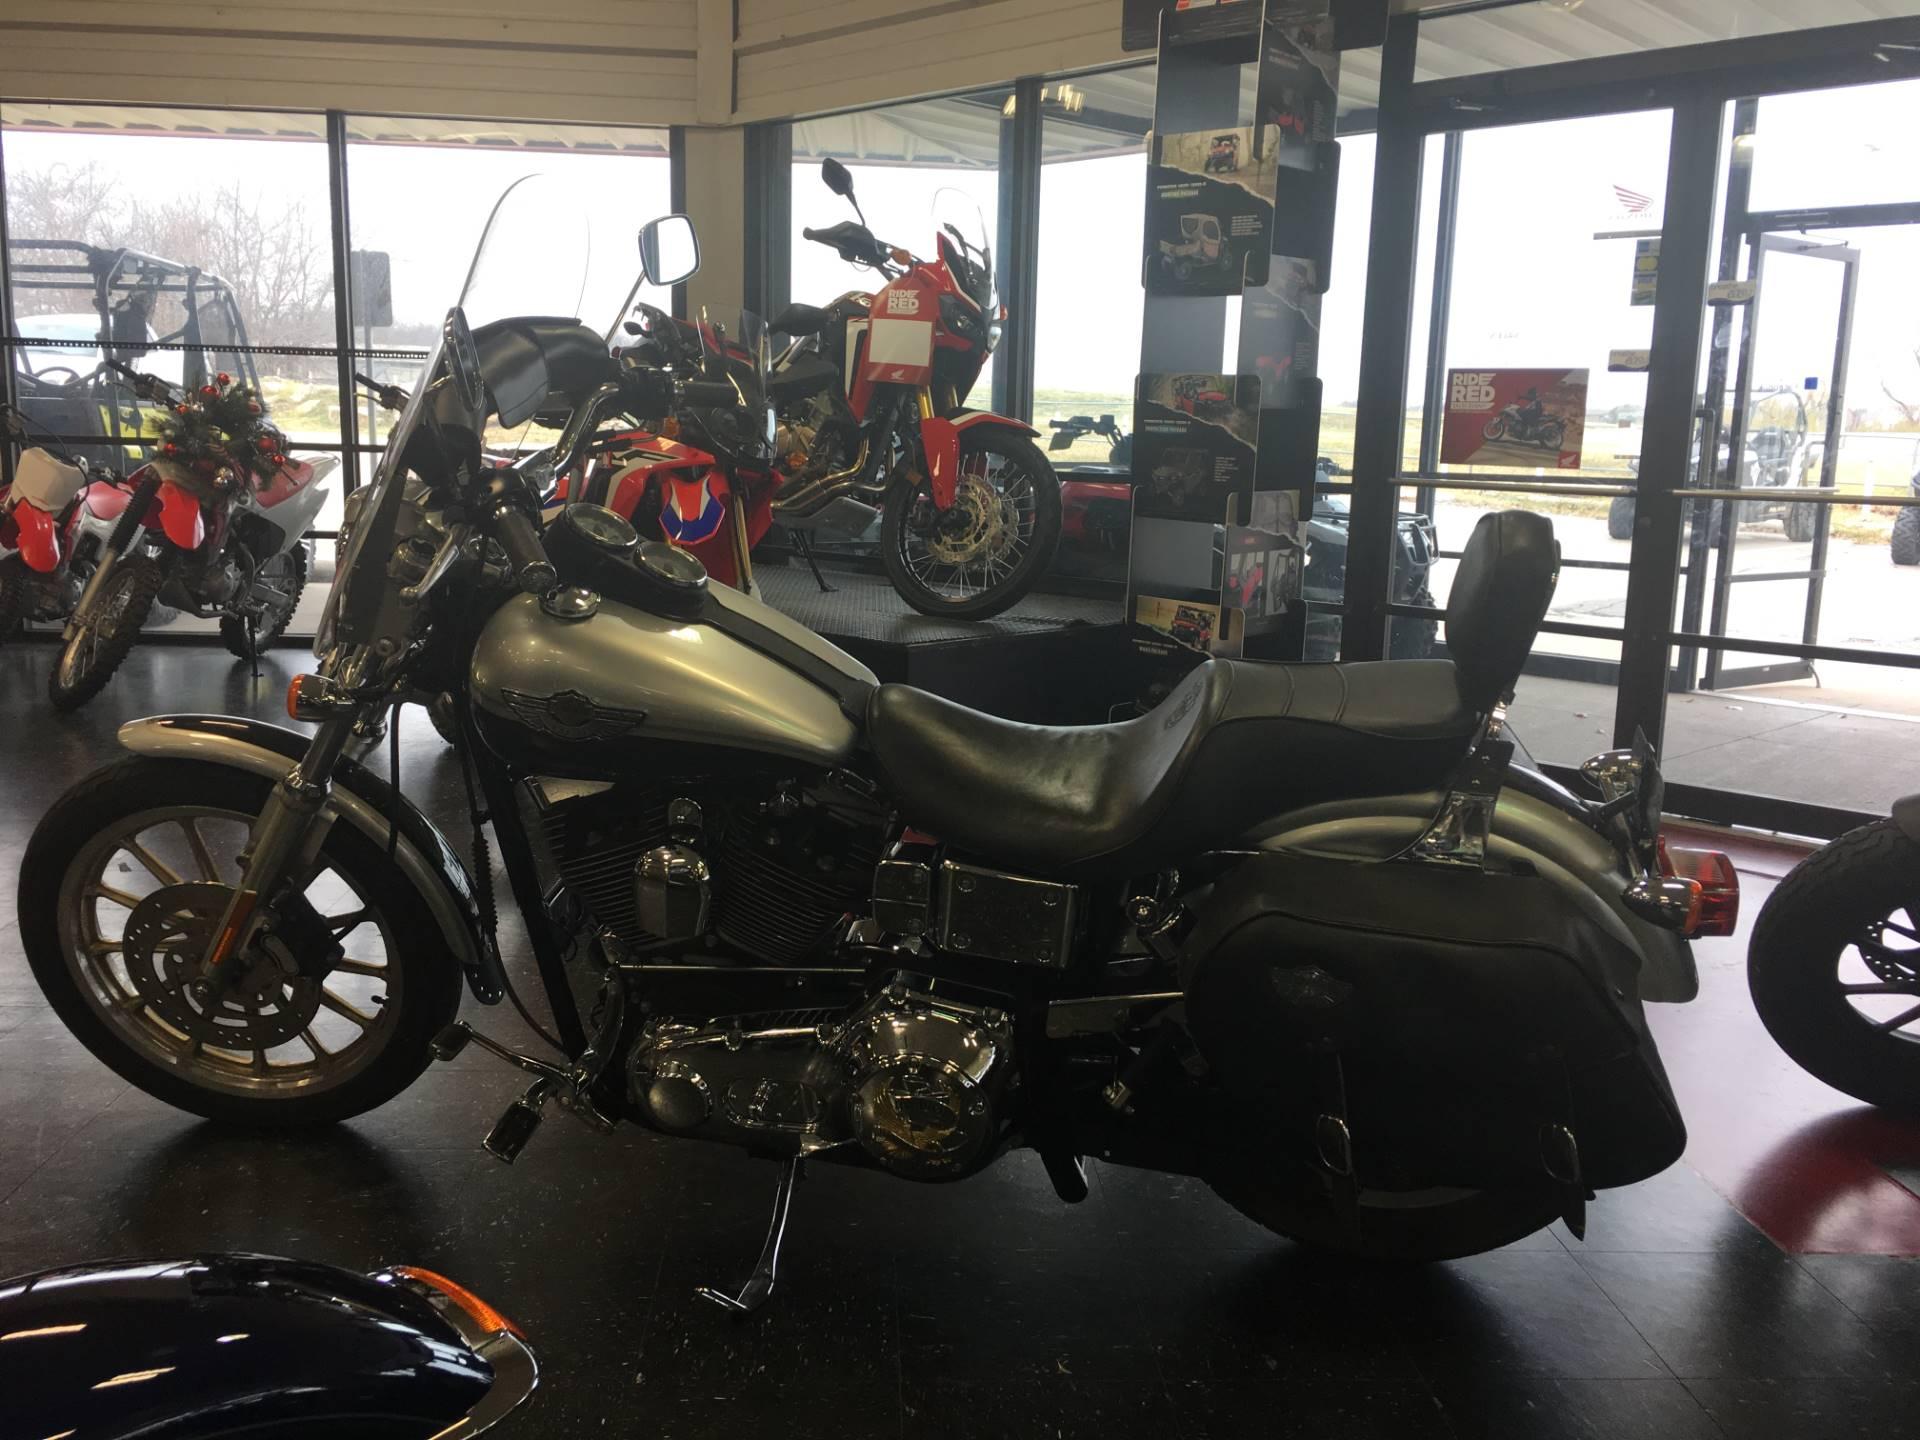 2003 Harley-Davidson FXDL Dyna Low Rider 1